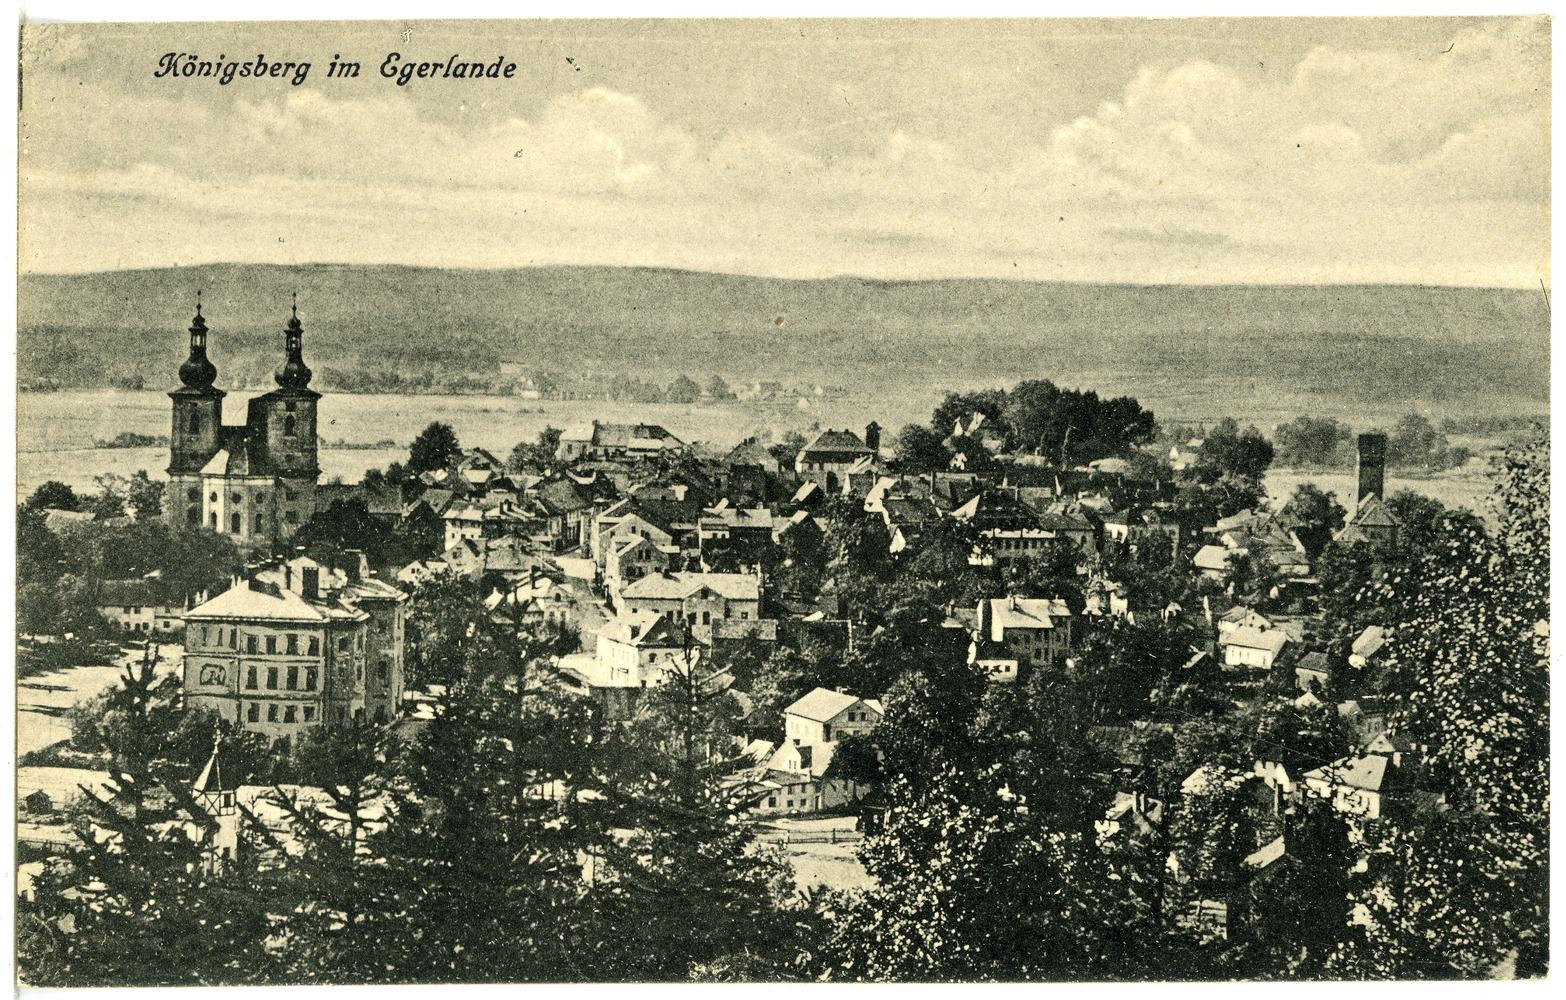 File:20678-Königsberg a. d. Eger-1917-Blick auf Königsberg-Brück ...